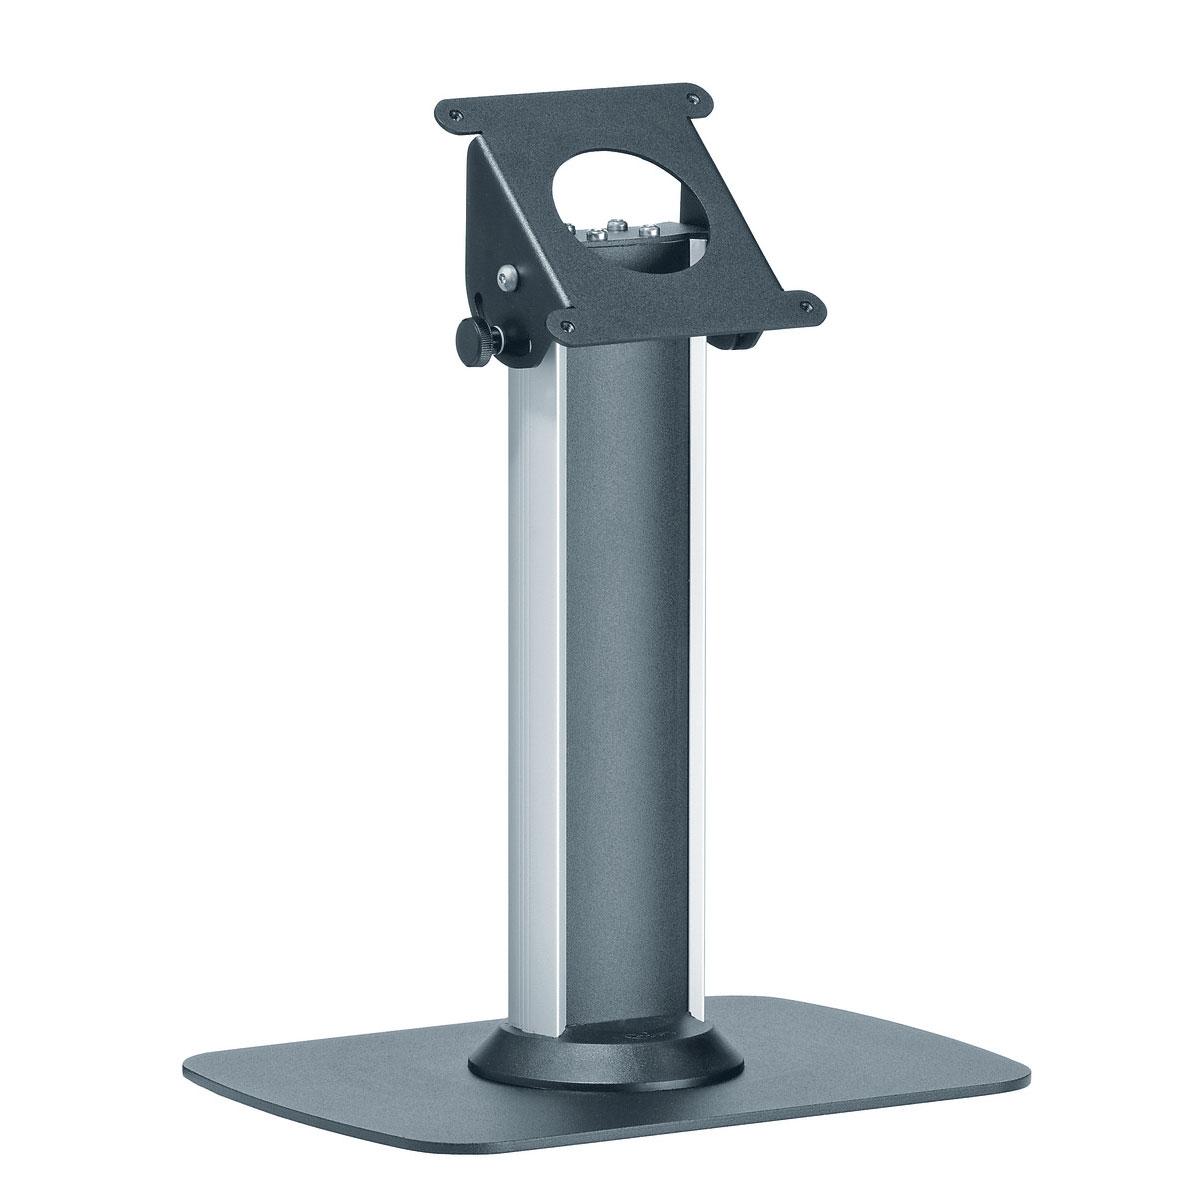 vogel 39 s pro pta3005b accessoires divers tablette vogel 39 s professional sur. Black Bedroom Furniture Sets. Home Design Ideas